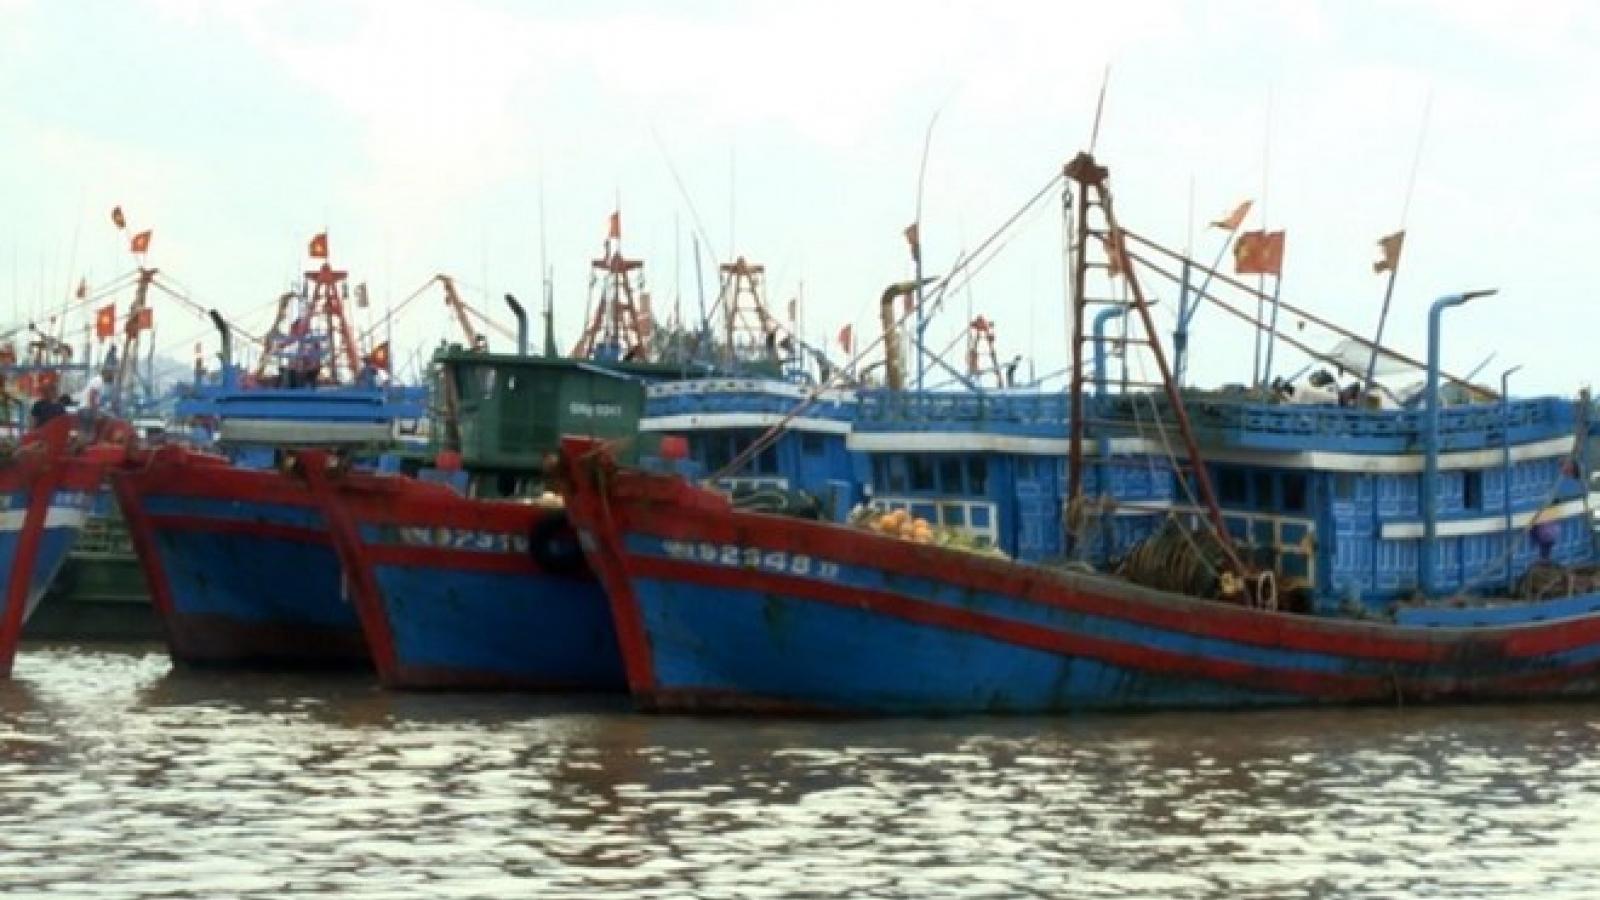 Vietnam, China negotiate cooperation in less sensitive marine areas